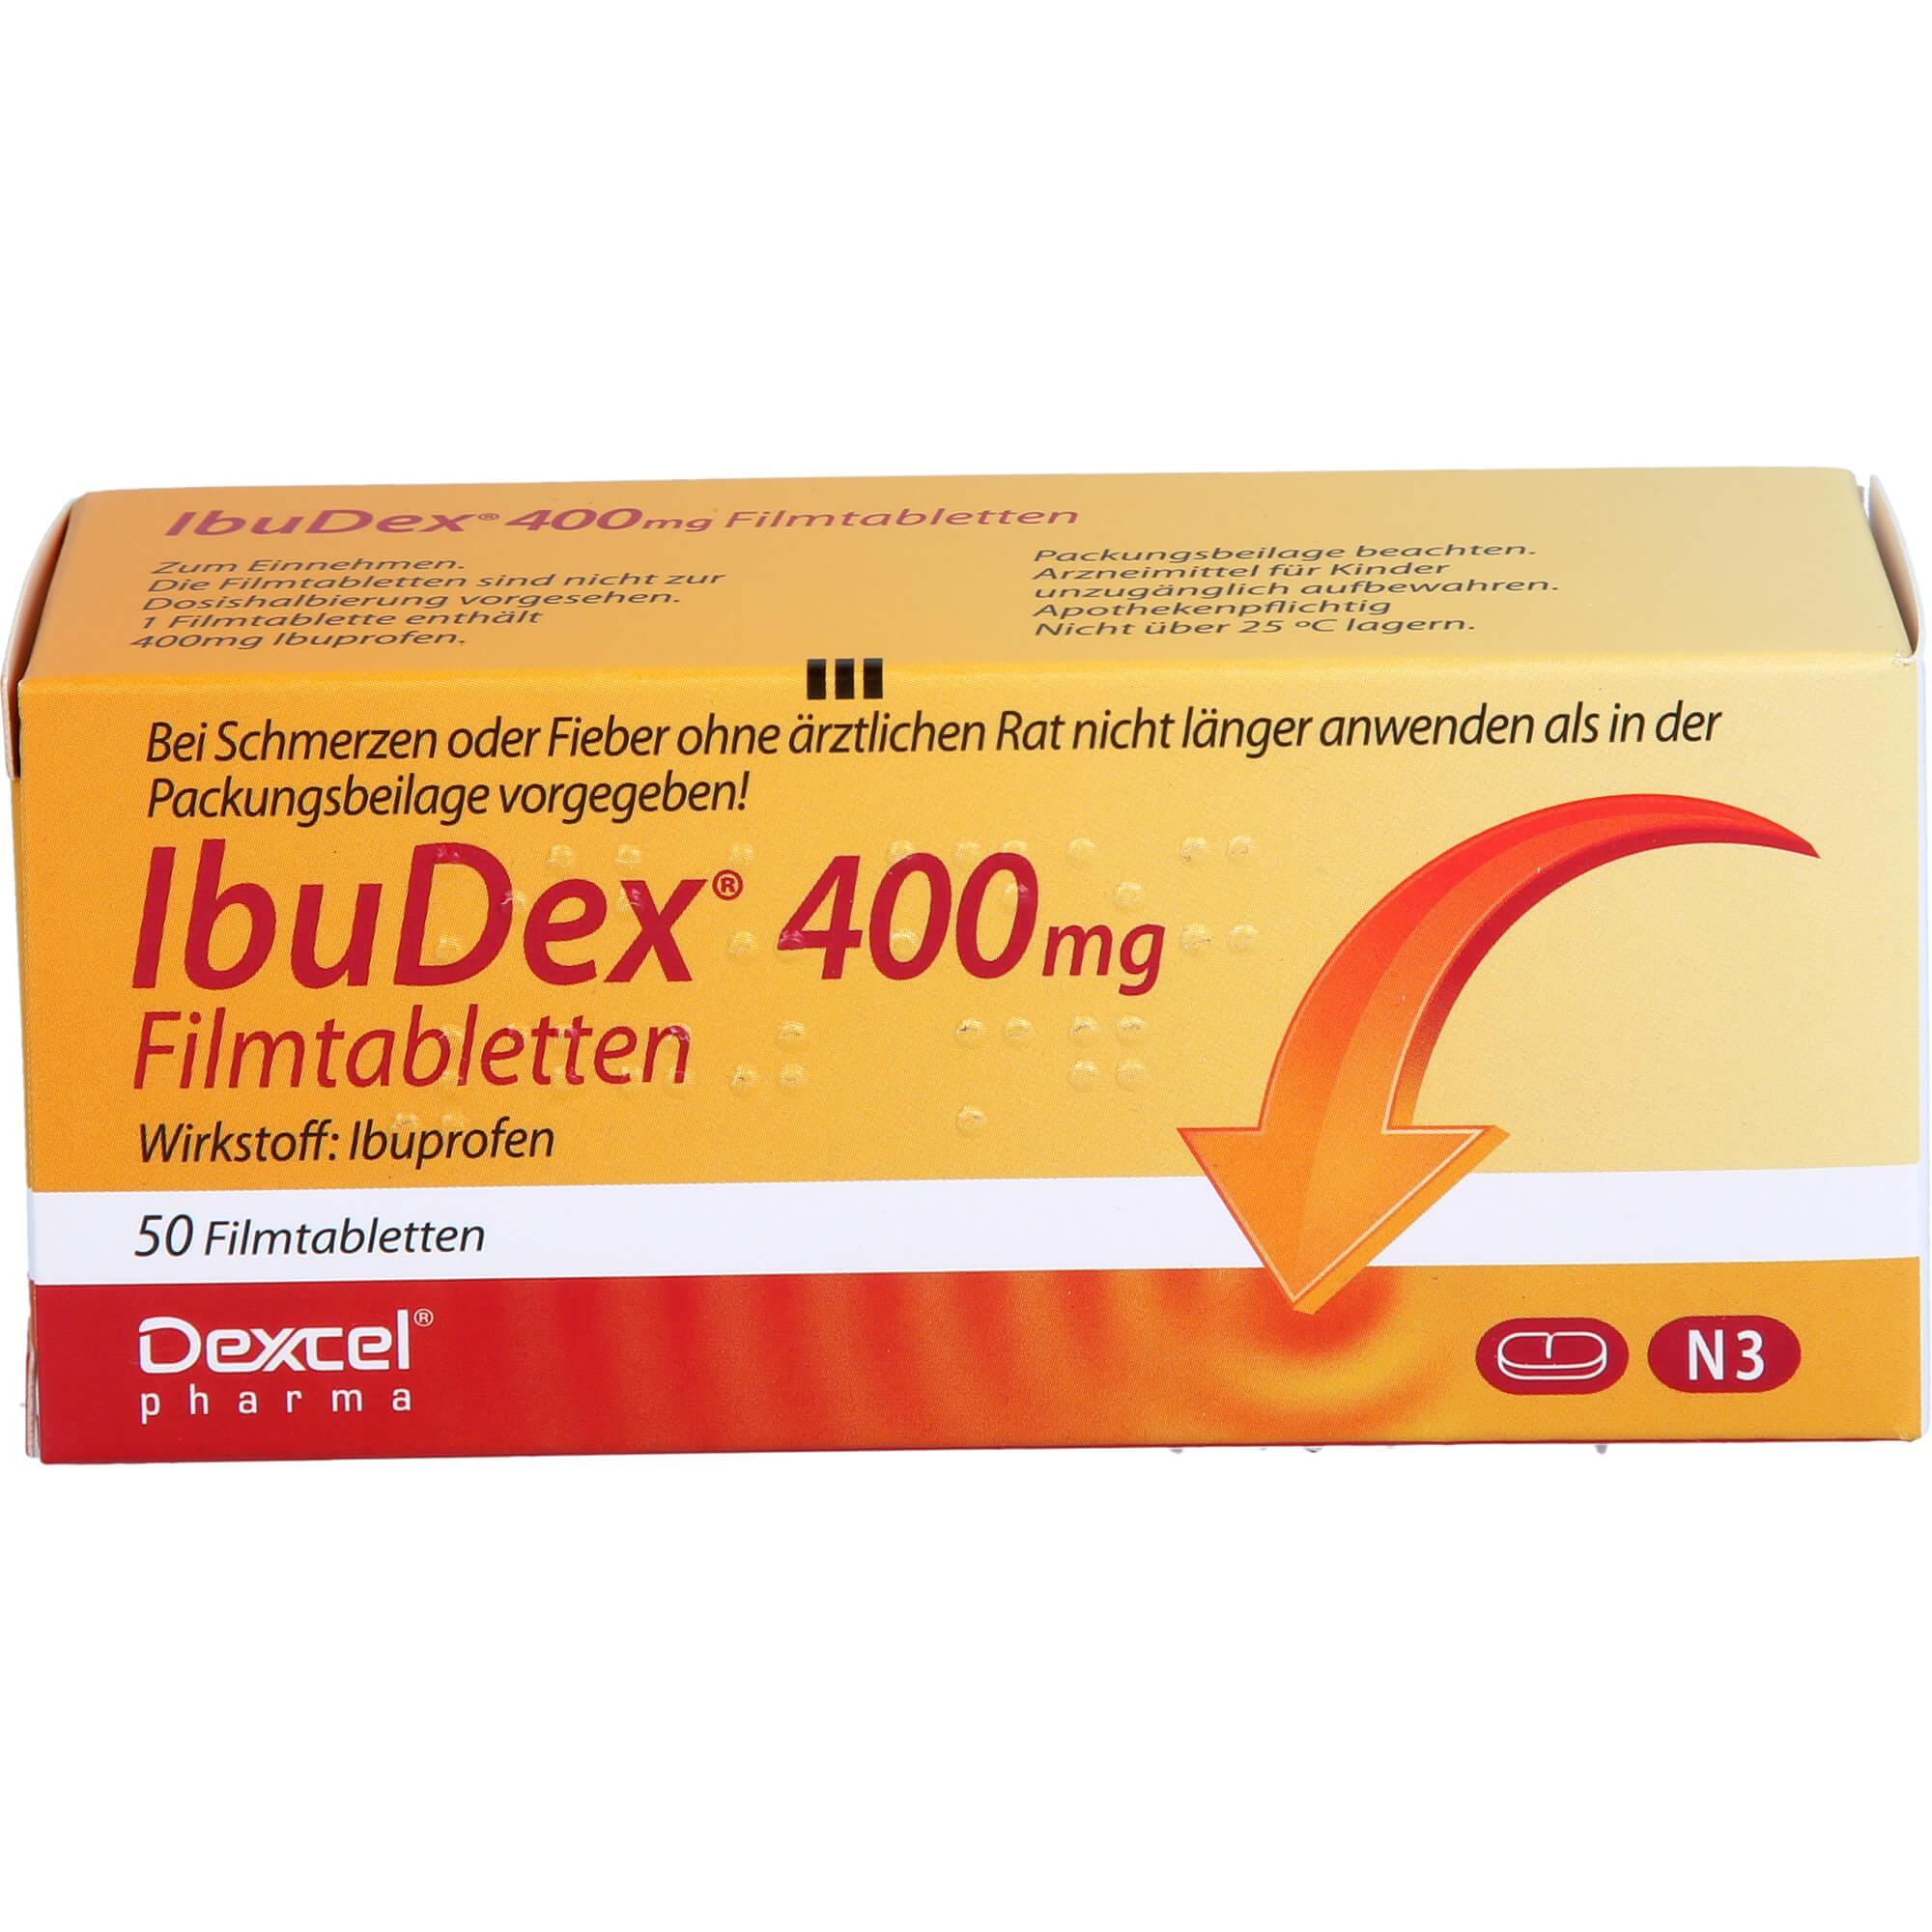 IBUDEX-400-mg-Filmtabletten